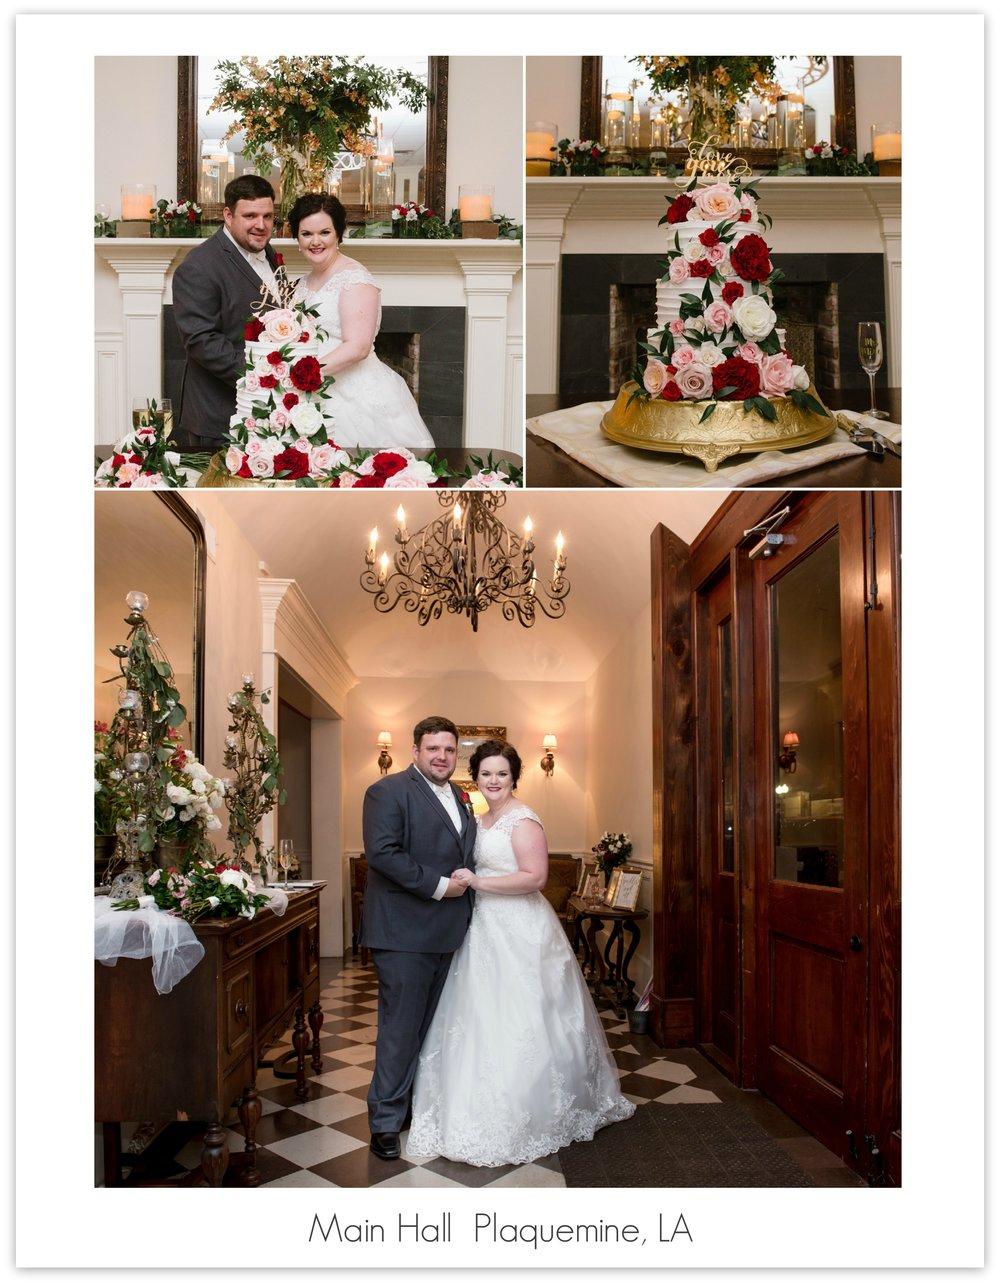 Main-Hall-Plaquemine-wedding